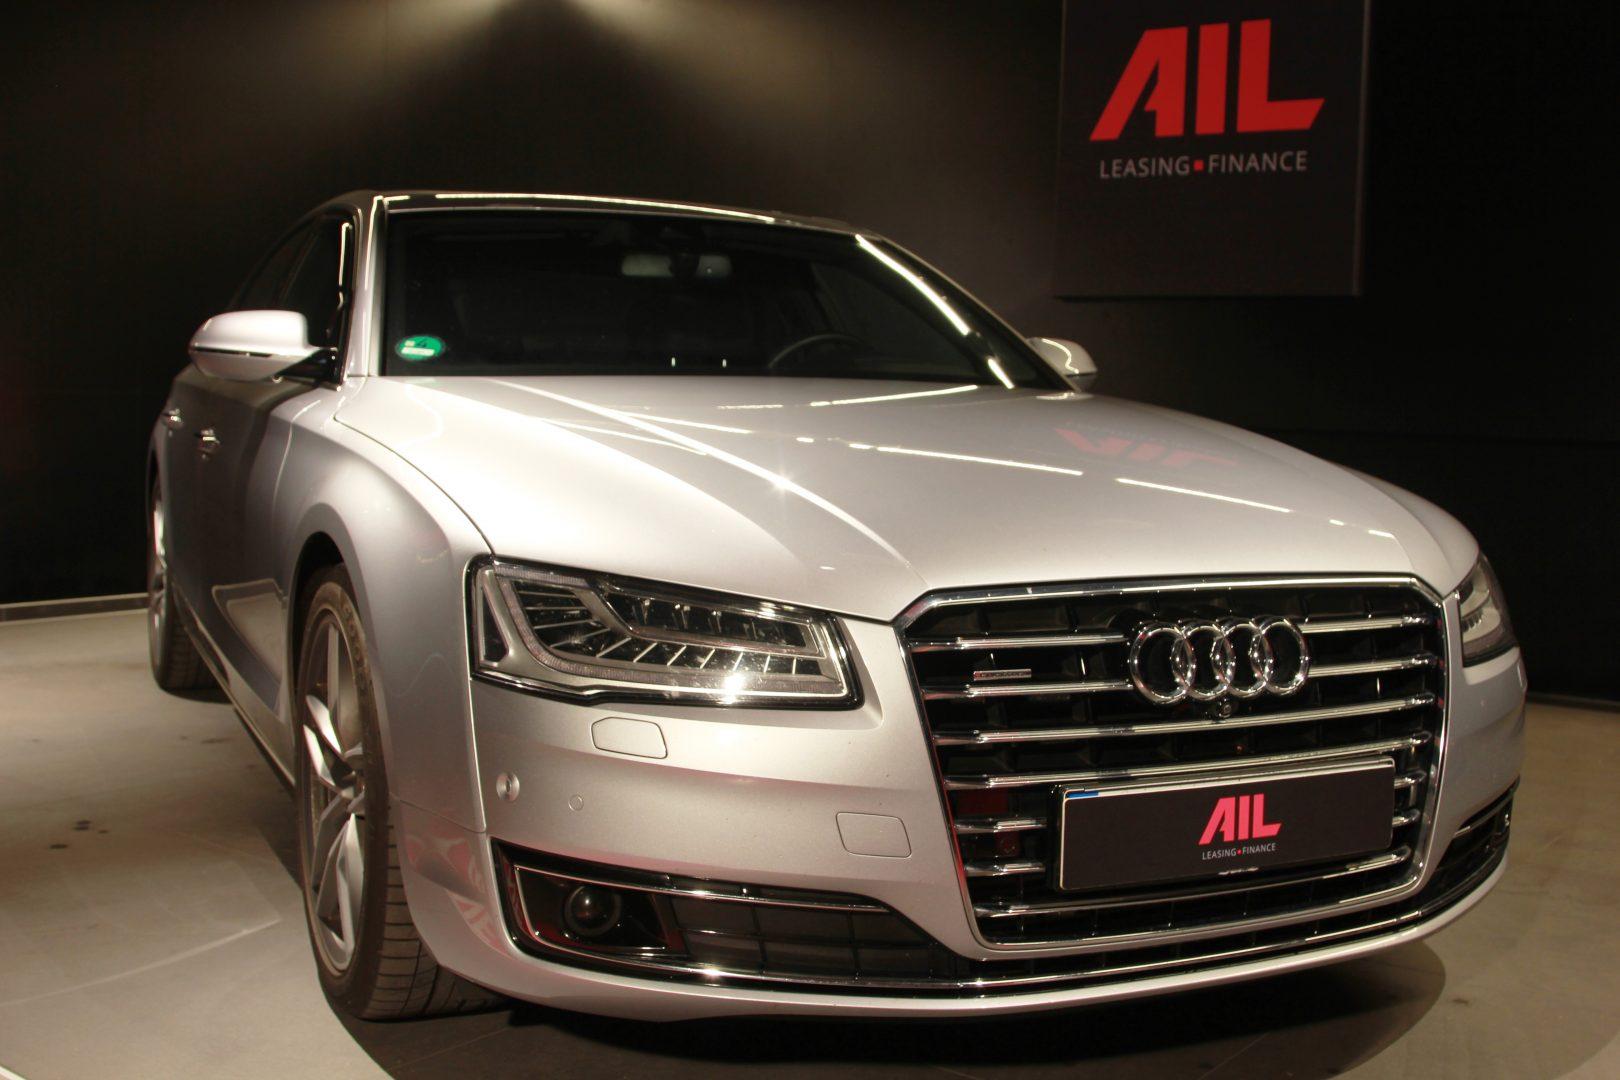 AIL Audi A8 3.0 TDI DAB Bose  3